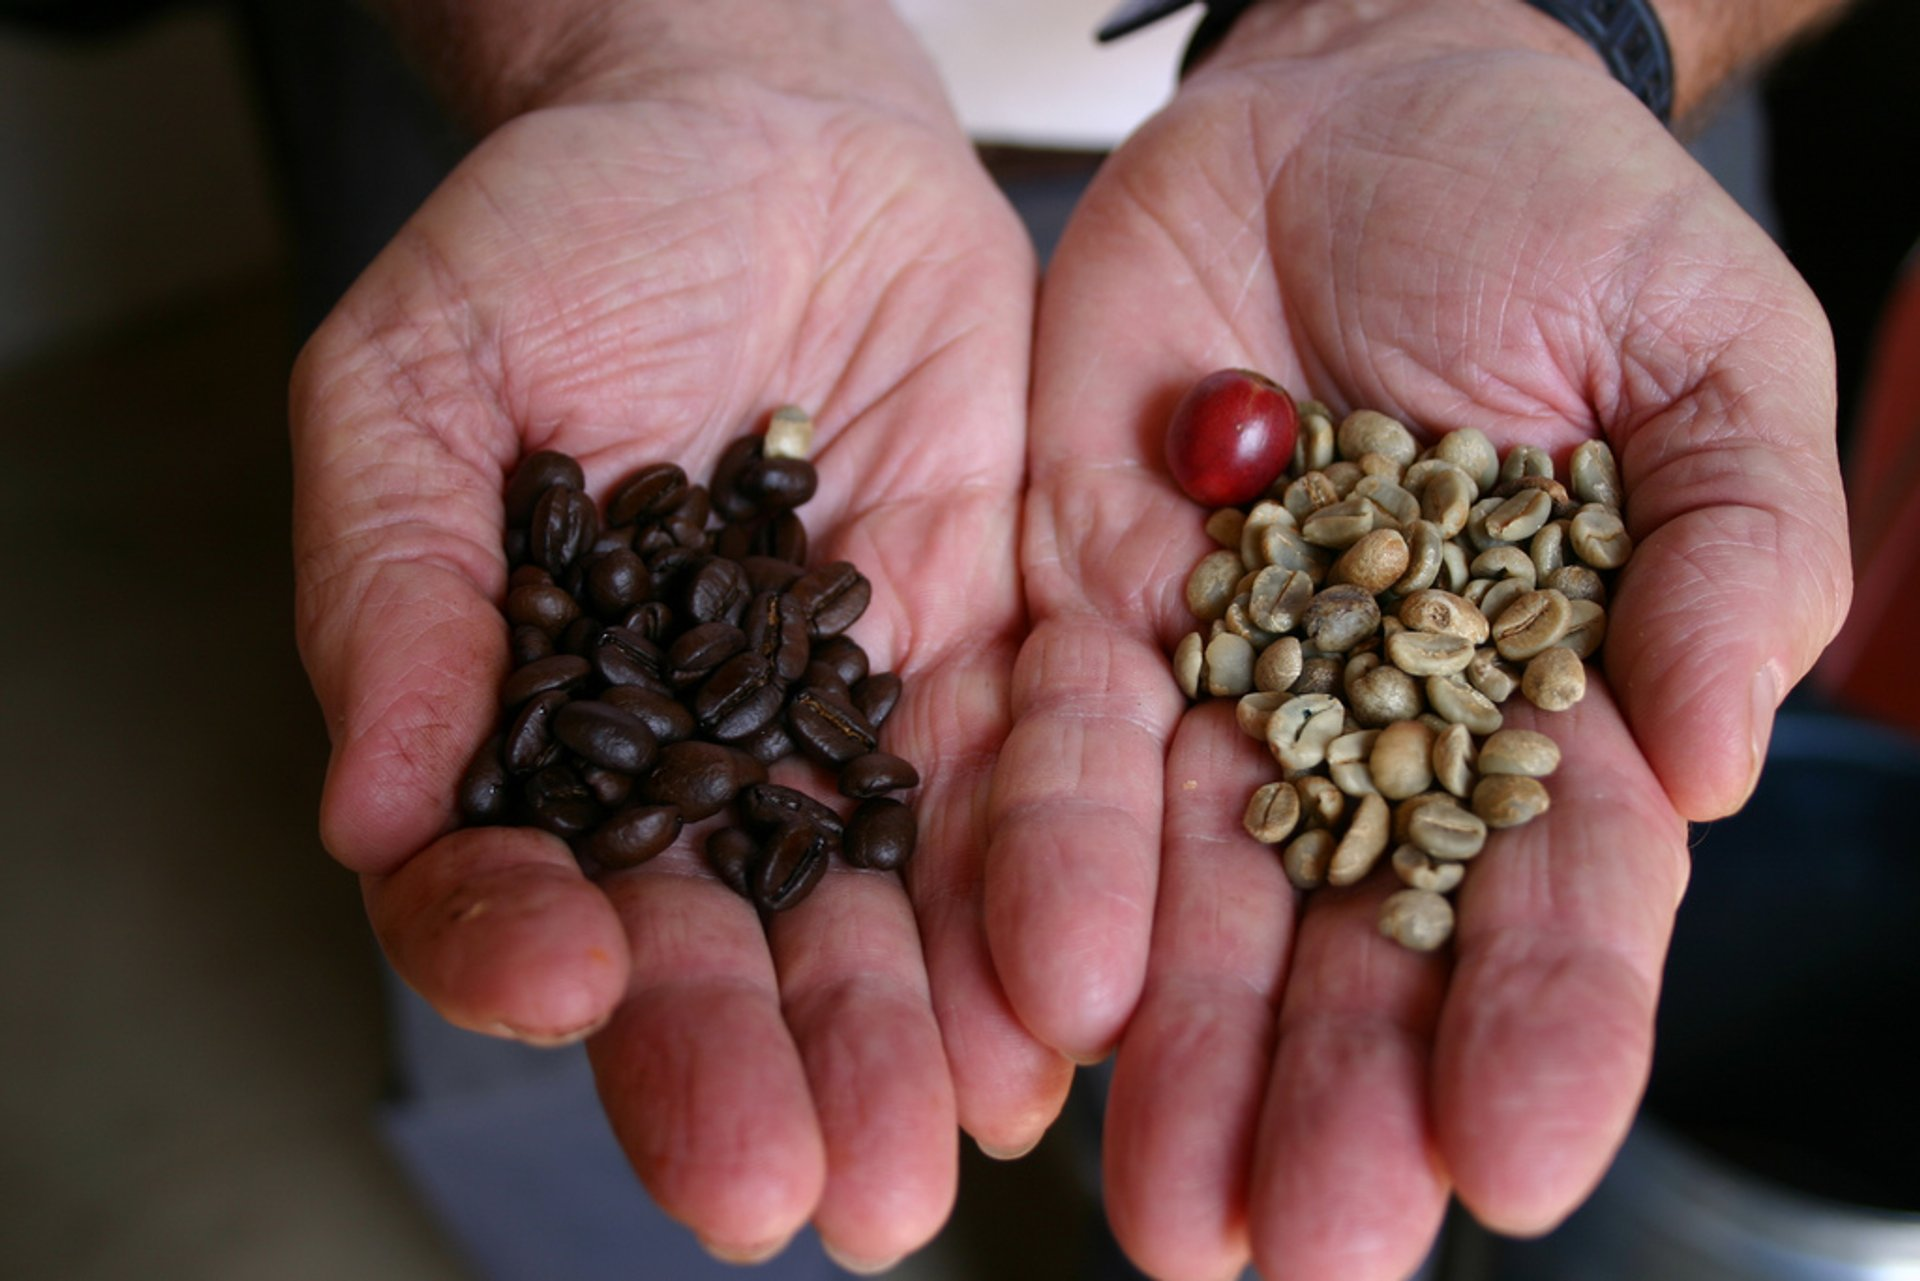 Coffee Bean Harvesting in Rio de Janeiro 2019 - Best Time